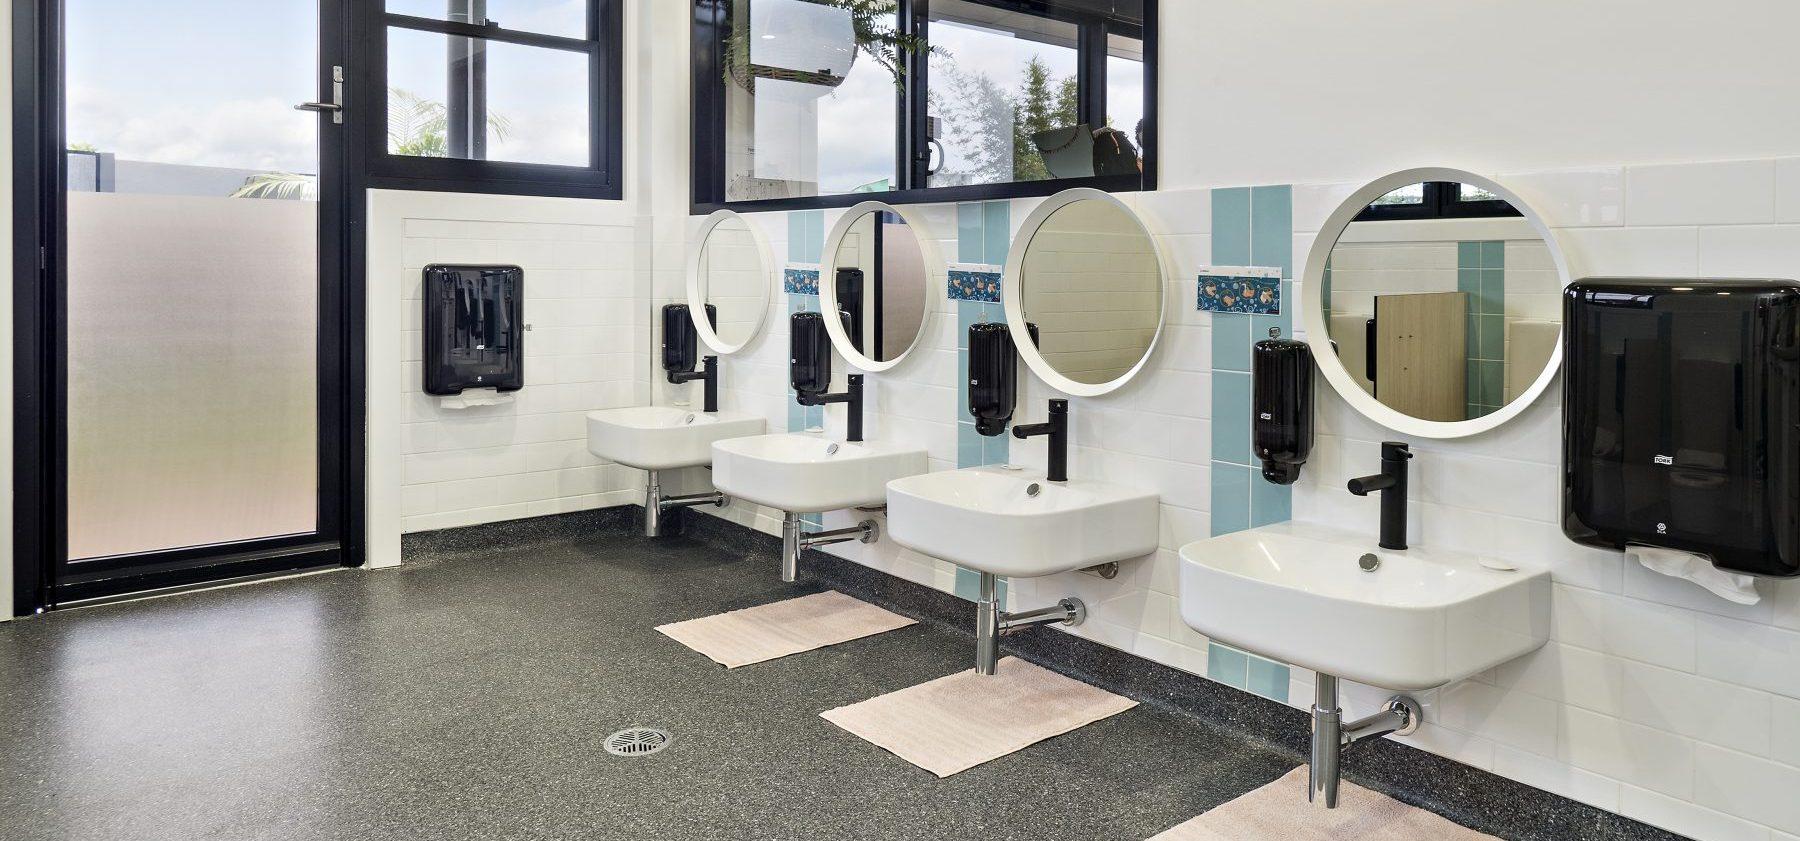 Yarrabilba Childcare Interior Bathroom